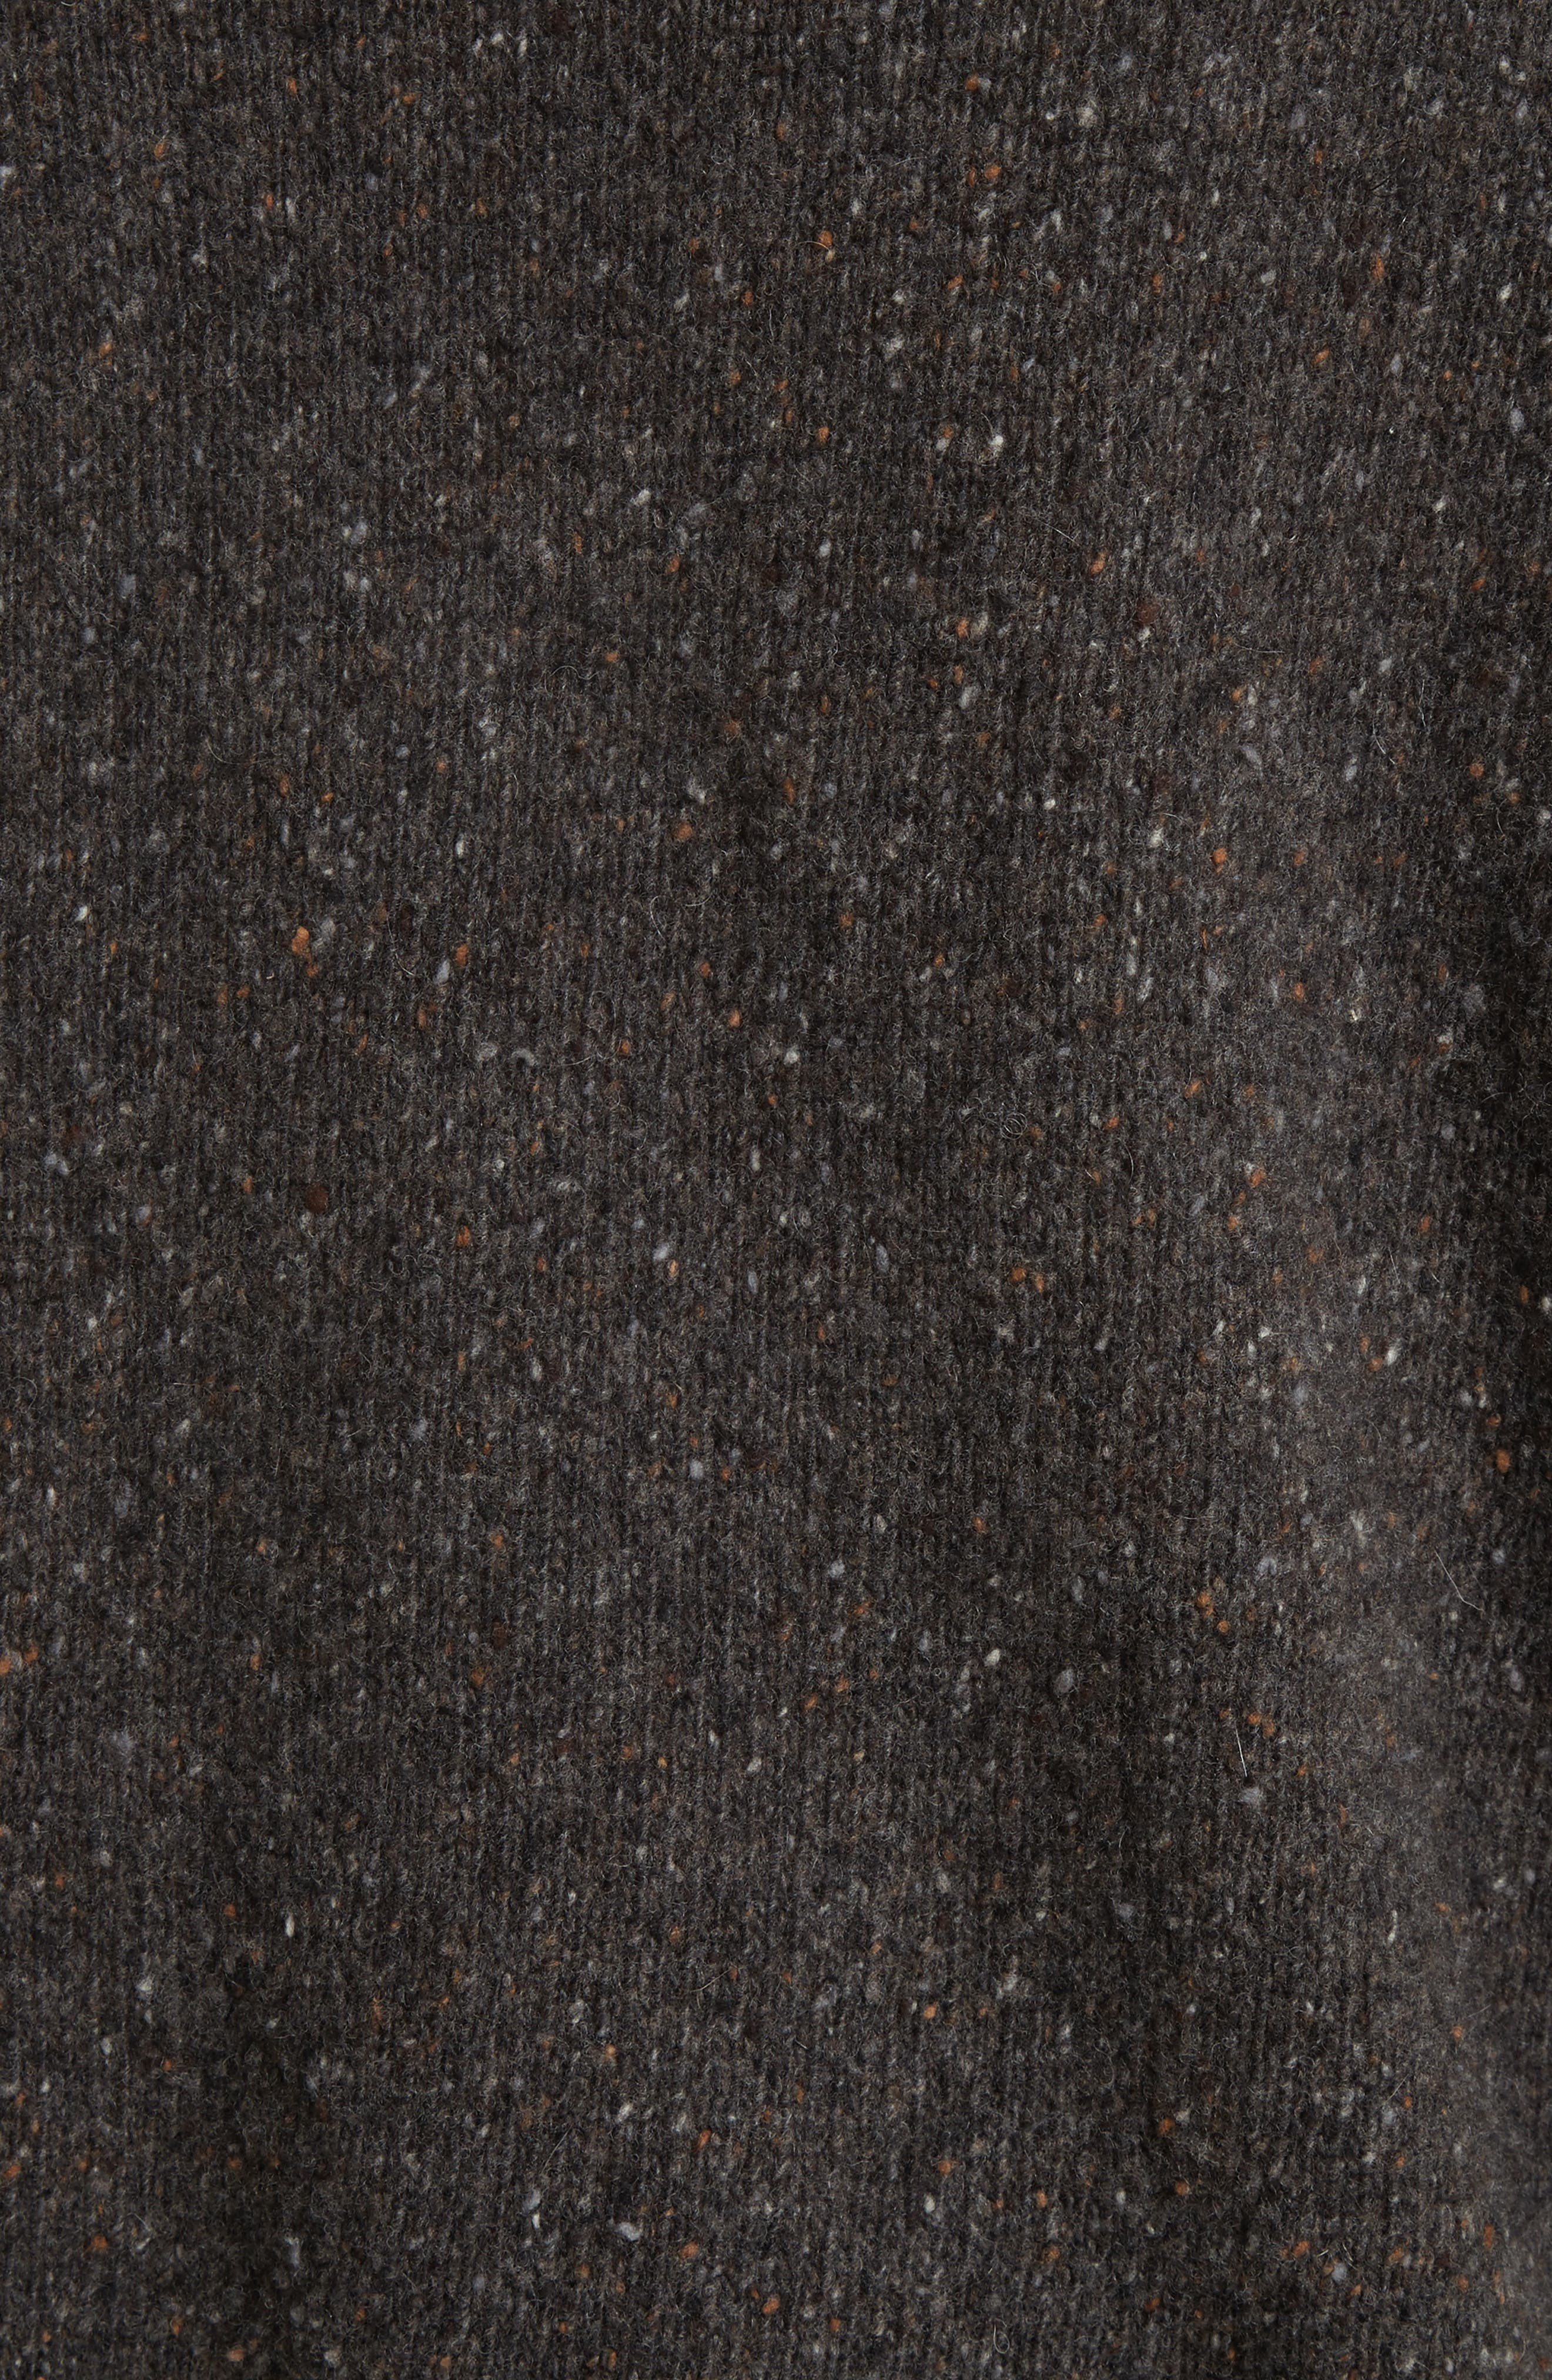 Cashmere Turtleneck Sweater,                             Alternate thumbnail 5, color,                             Charcoal